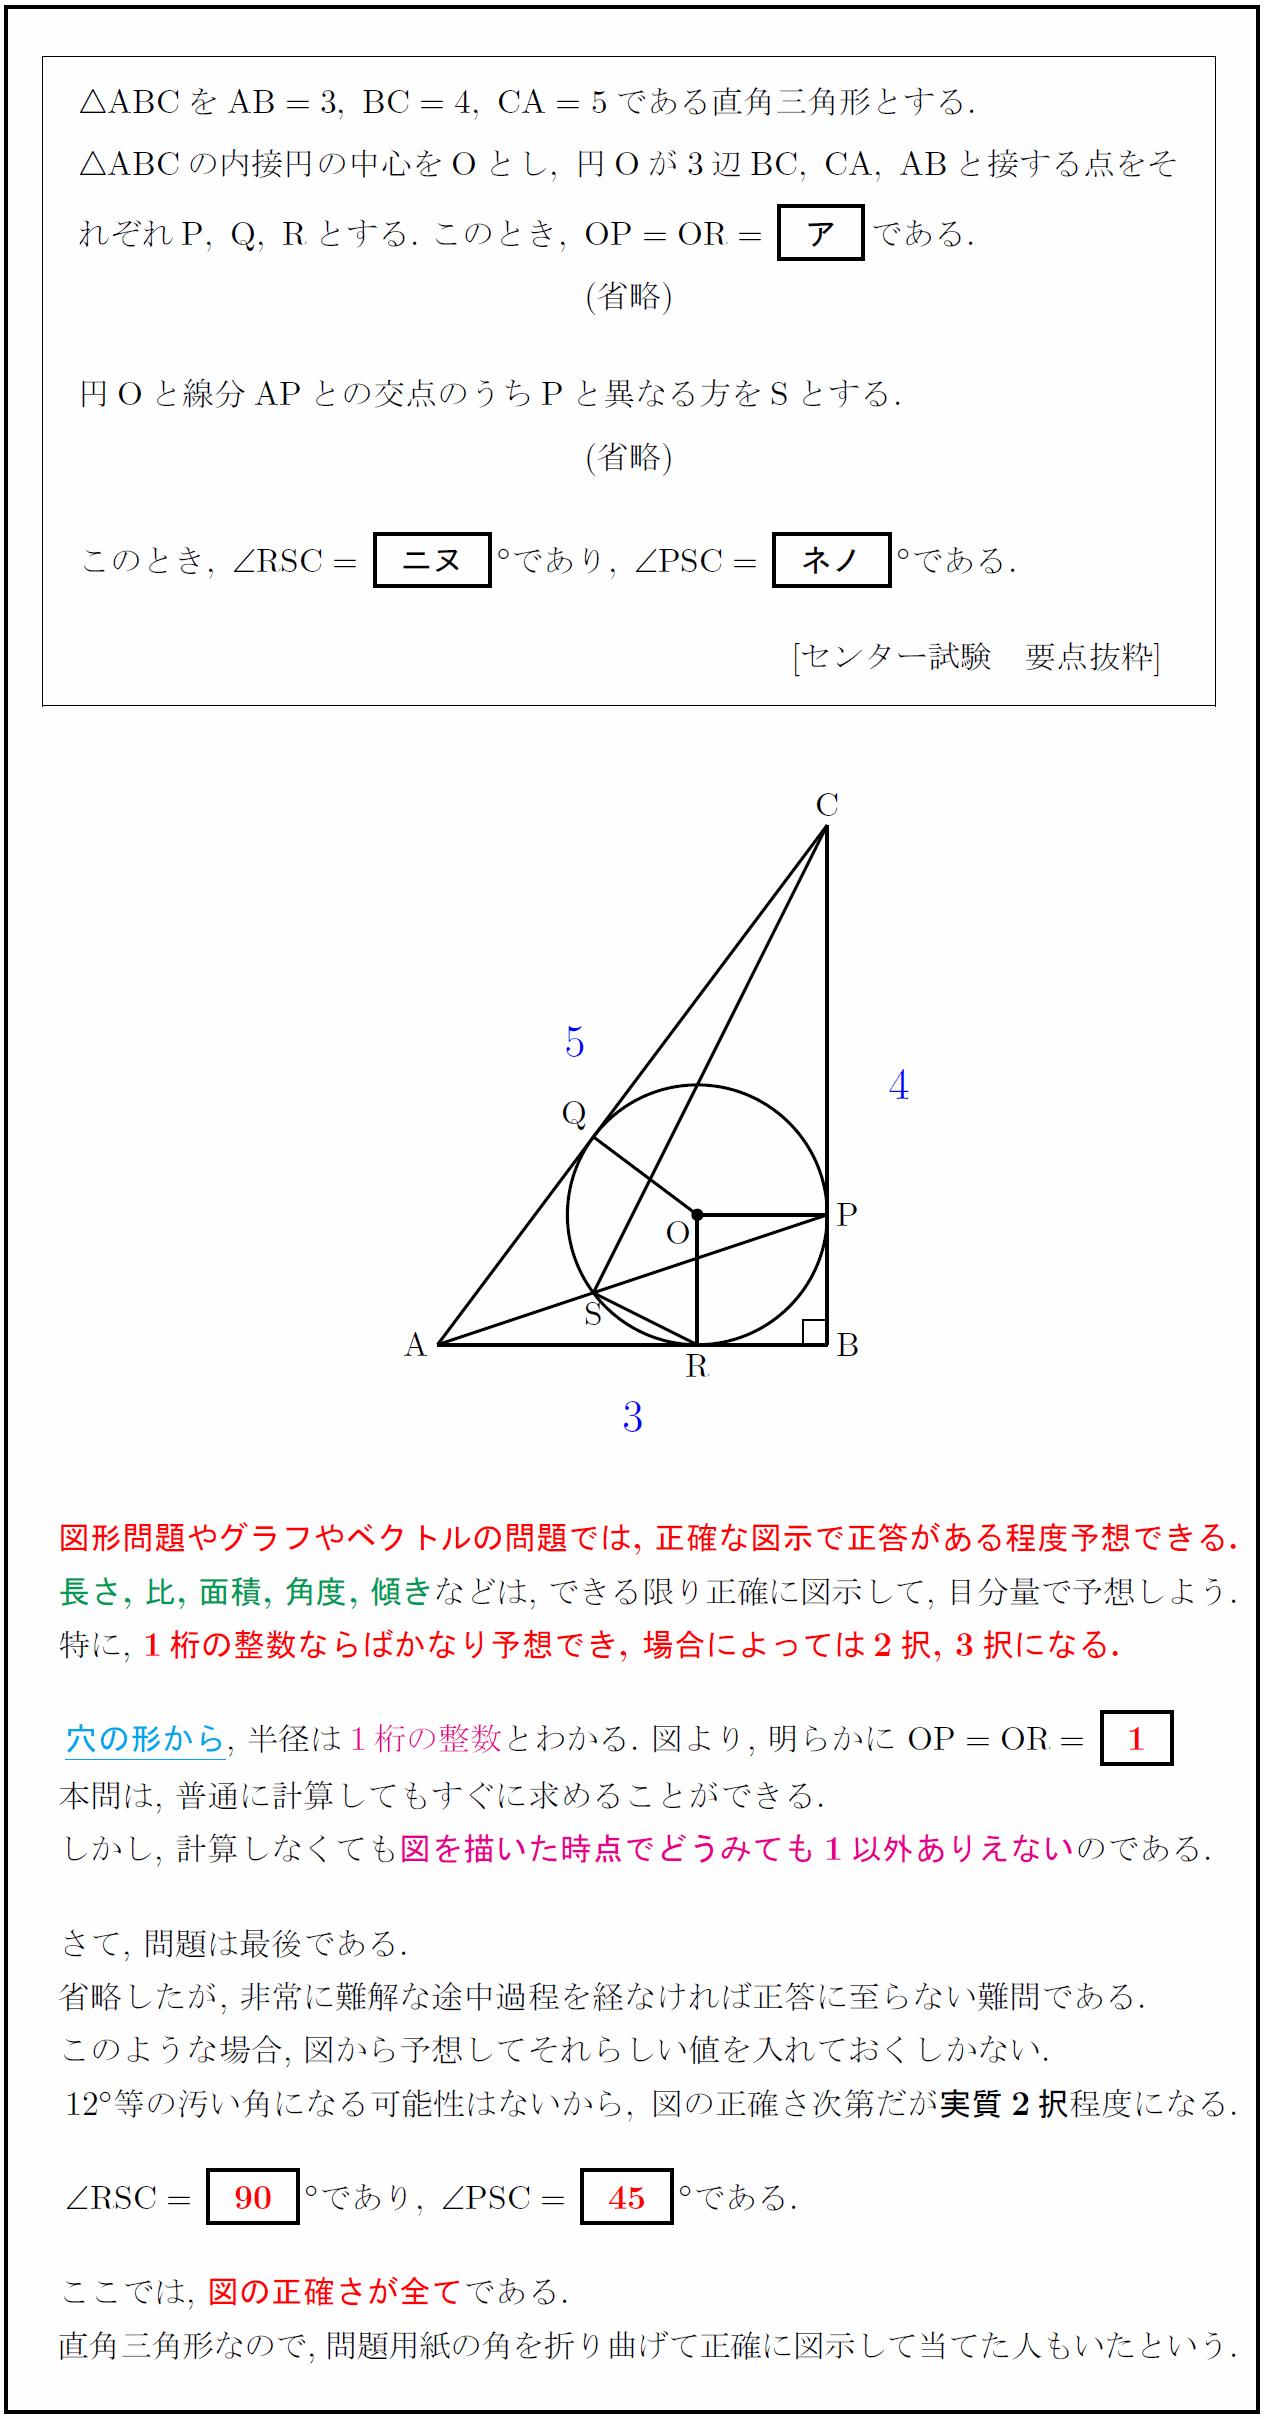 precise-figure